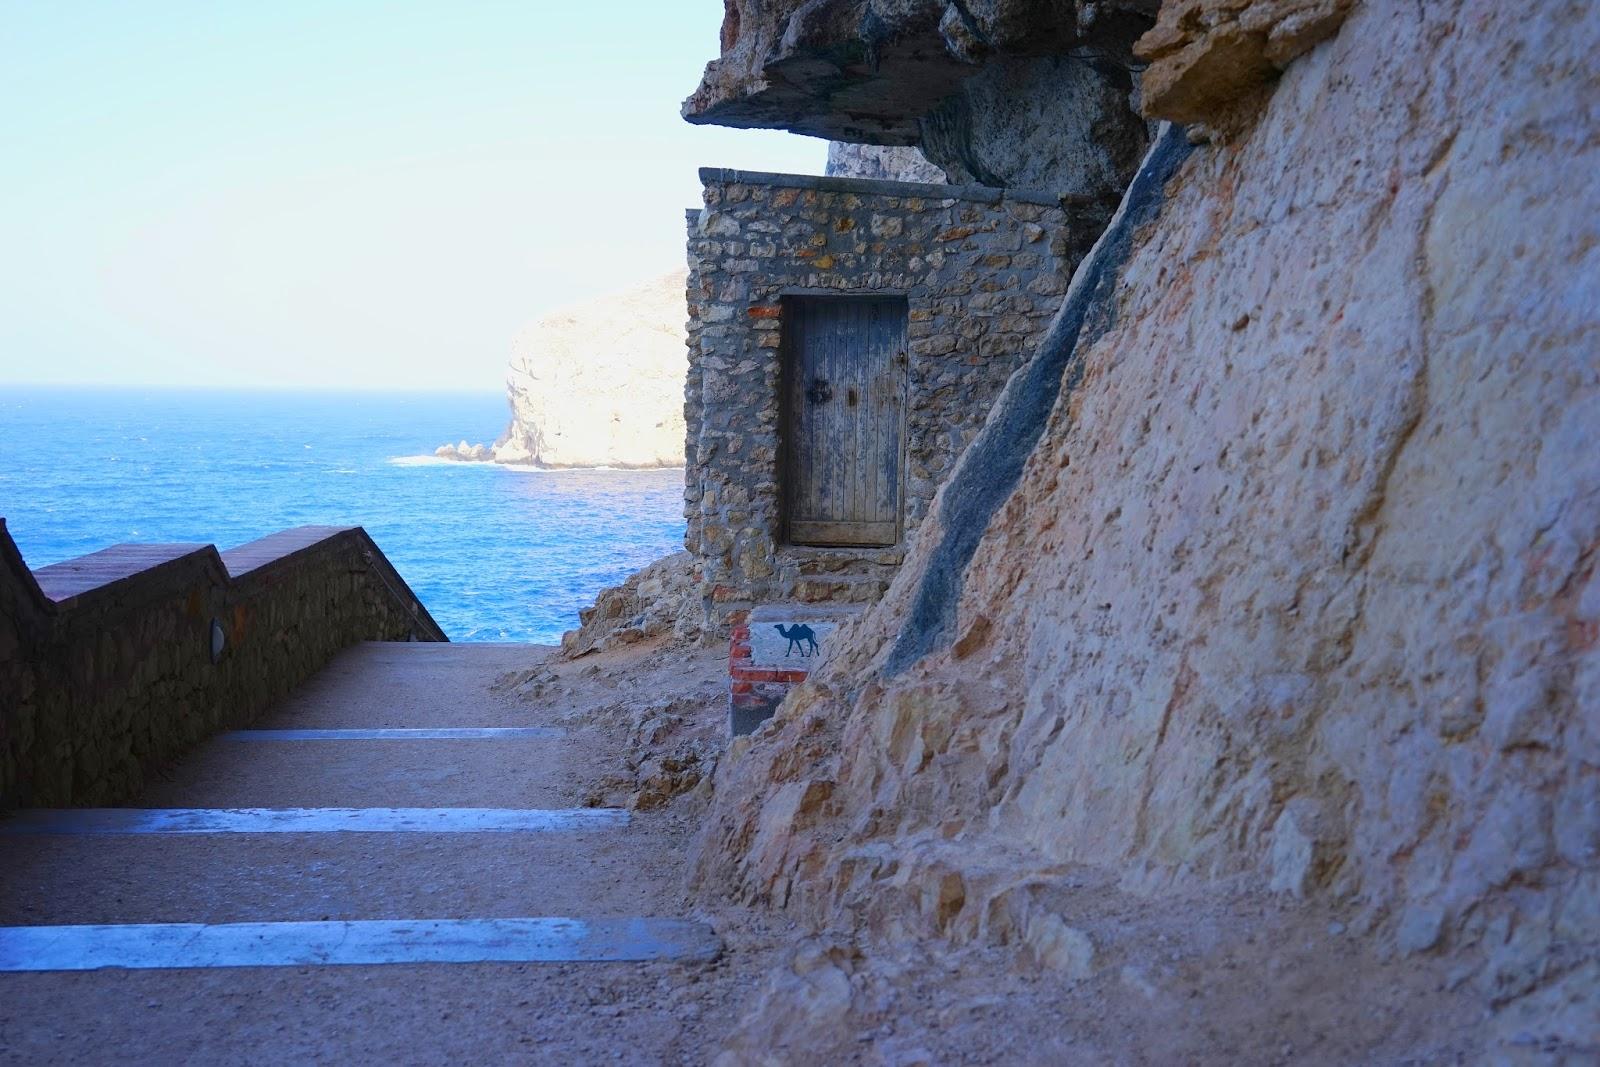 Le Chameau Bleu - Blog Voyage Sardaigne - Cabanon sur le chemin Grotto di nettuno  Grotte de Neptune Sardaigne